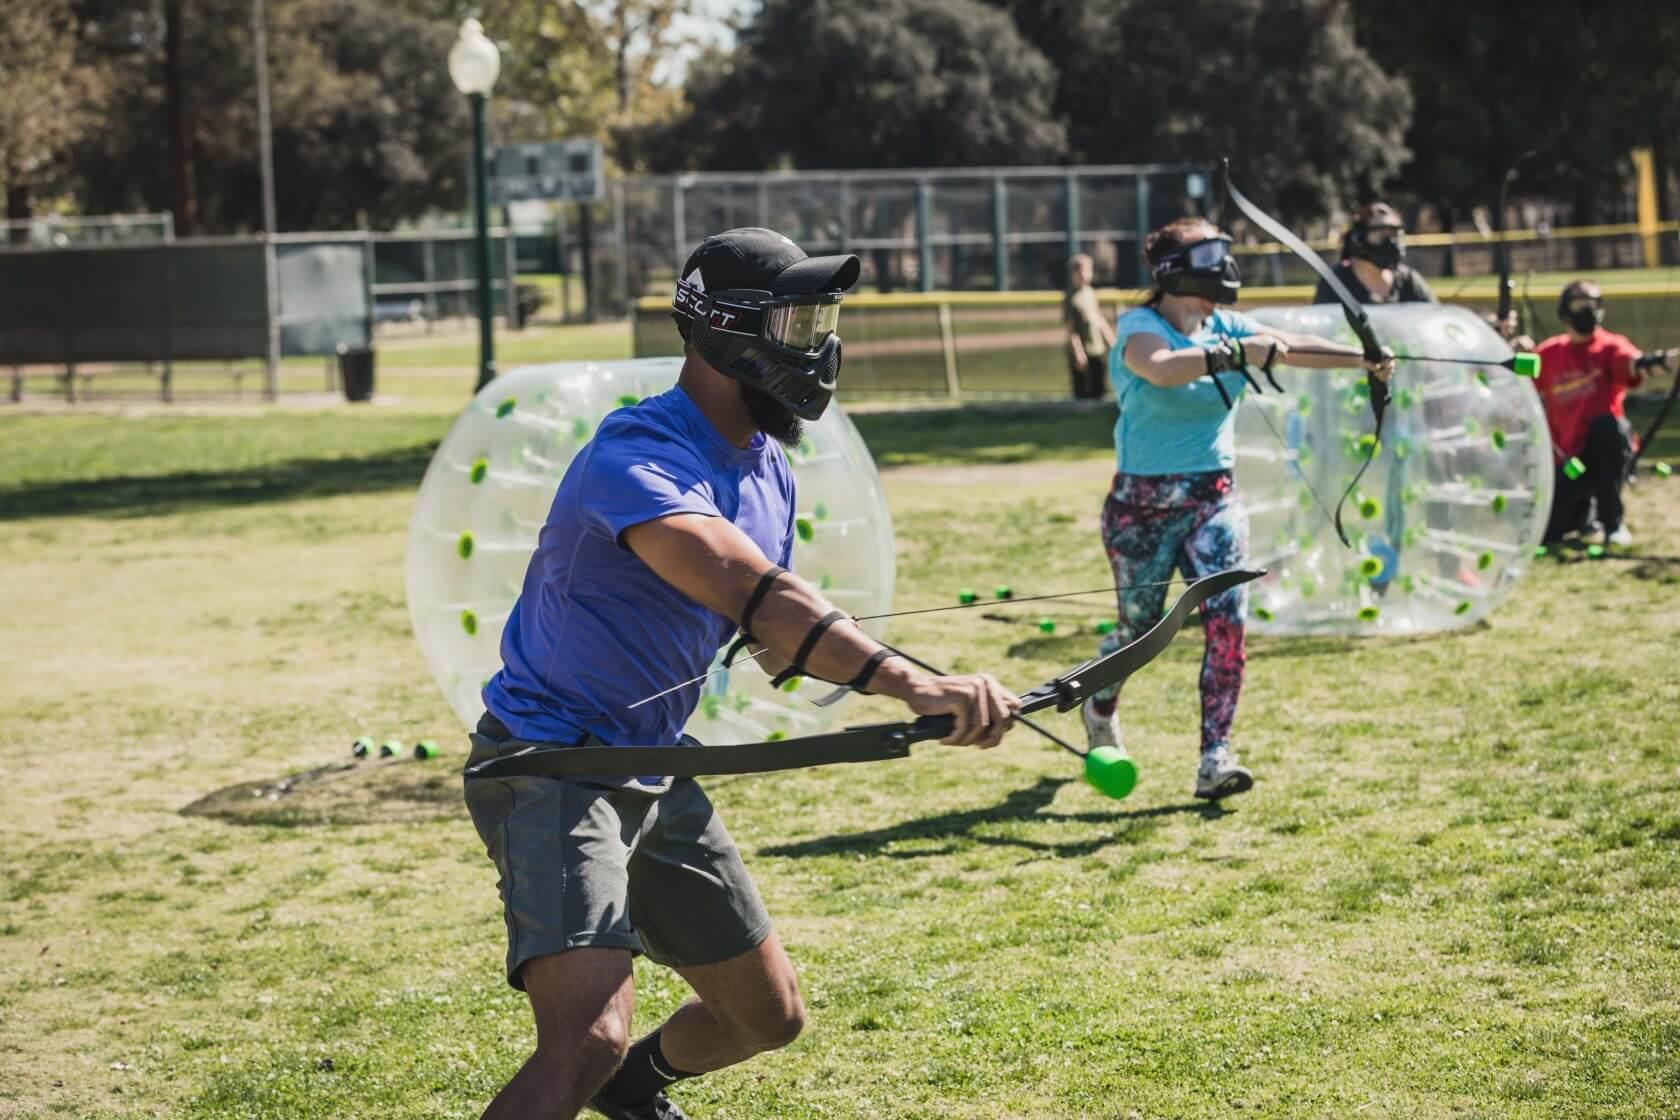 Advance Forward | Archery Tag by AirballingLA